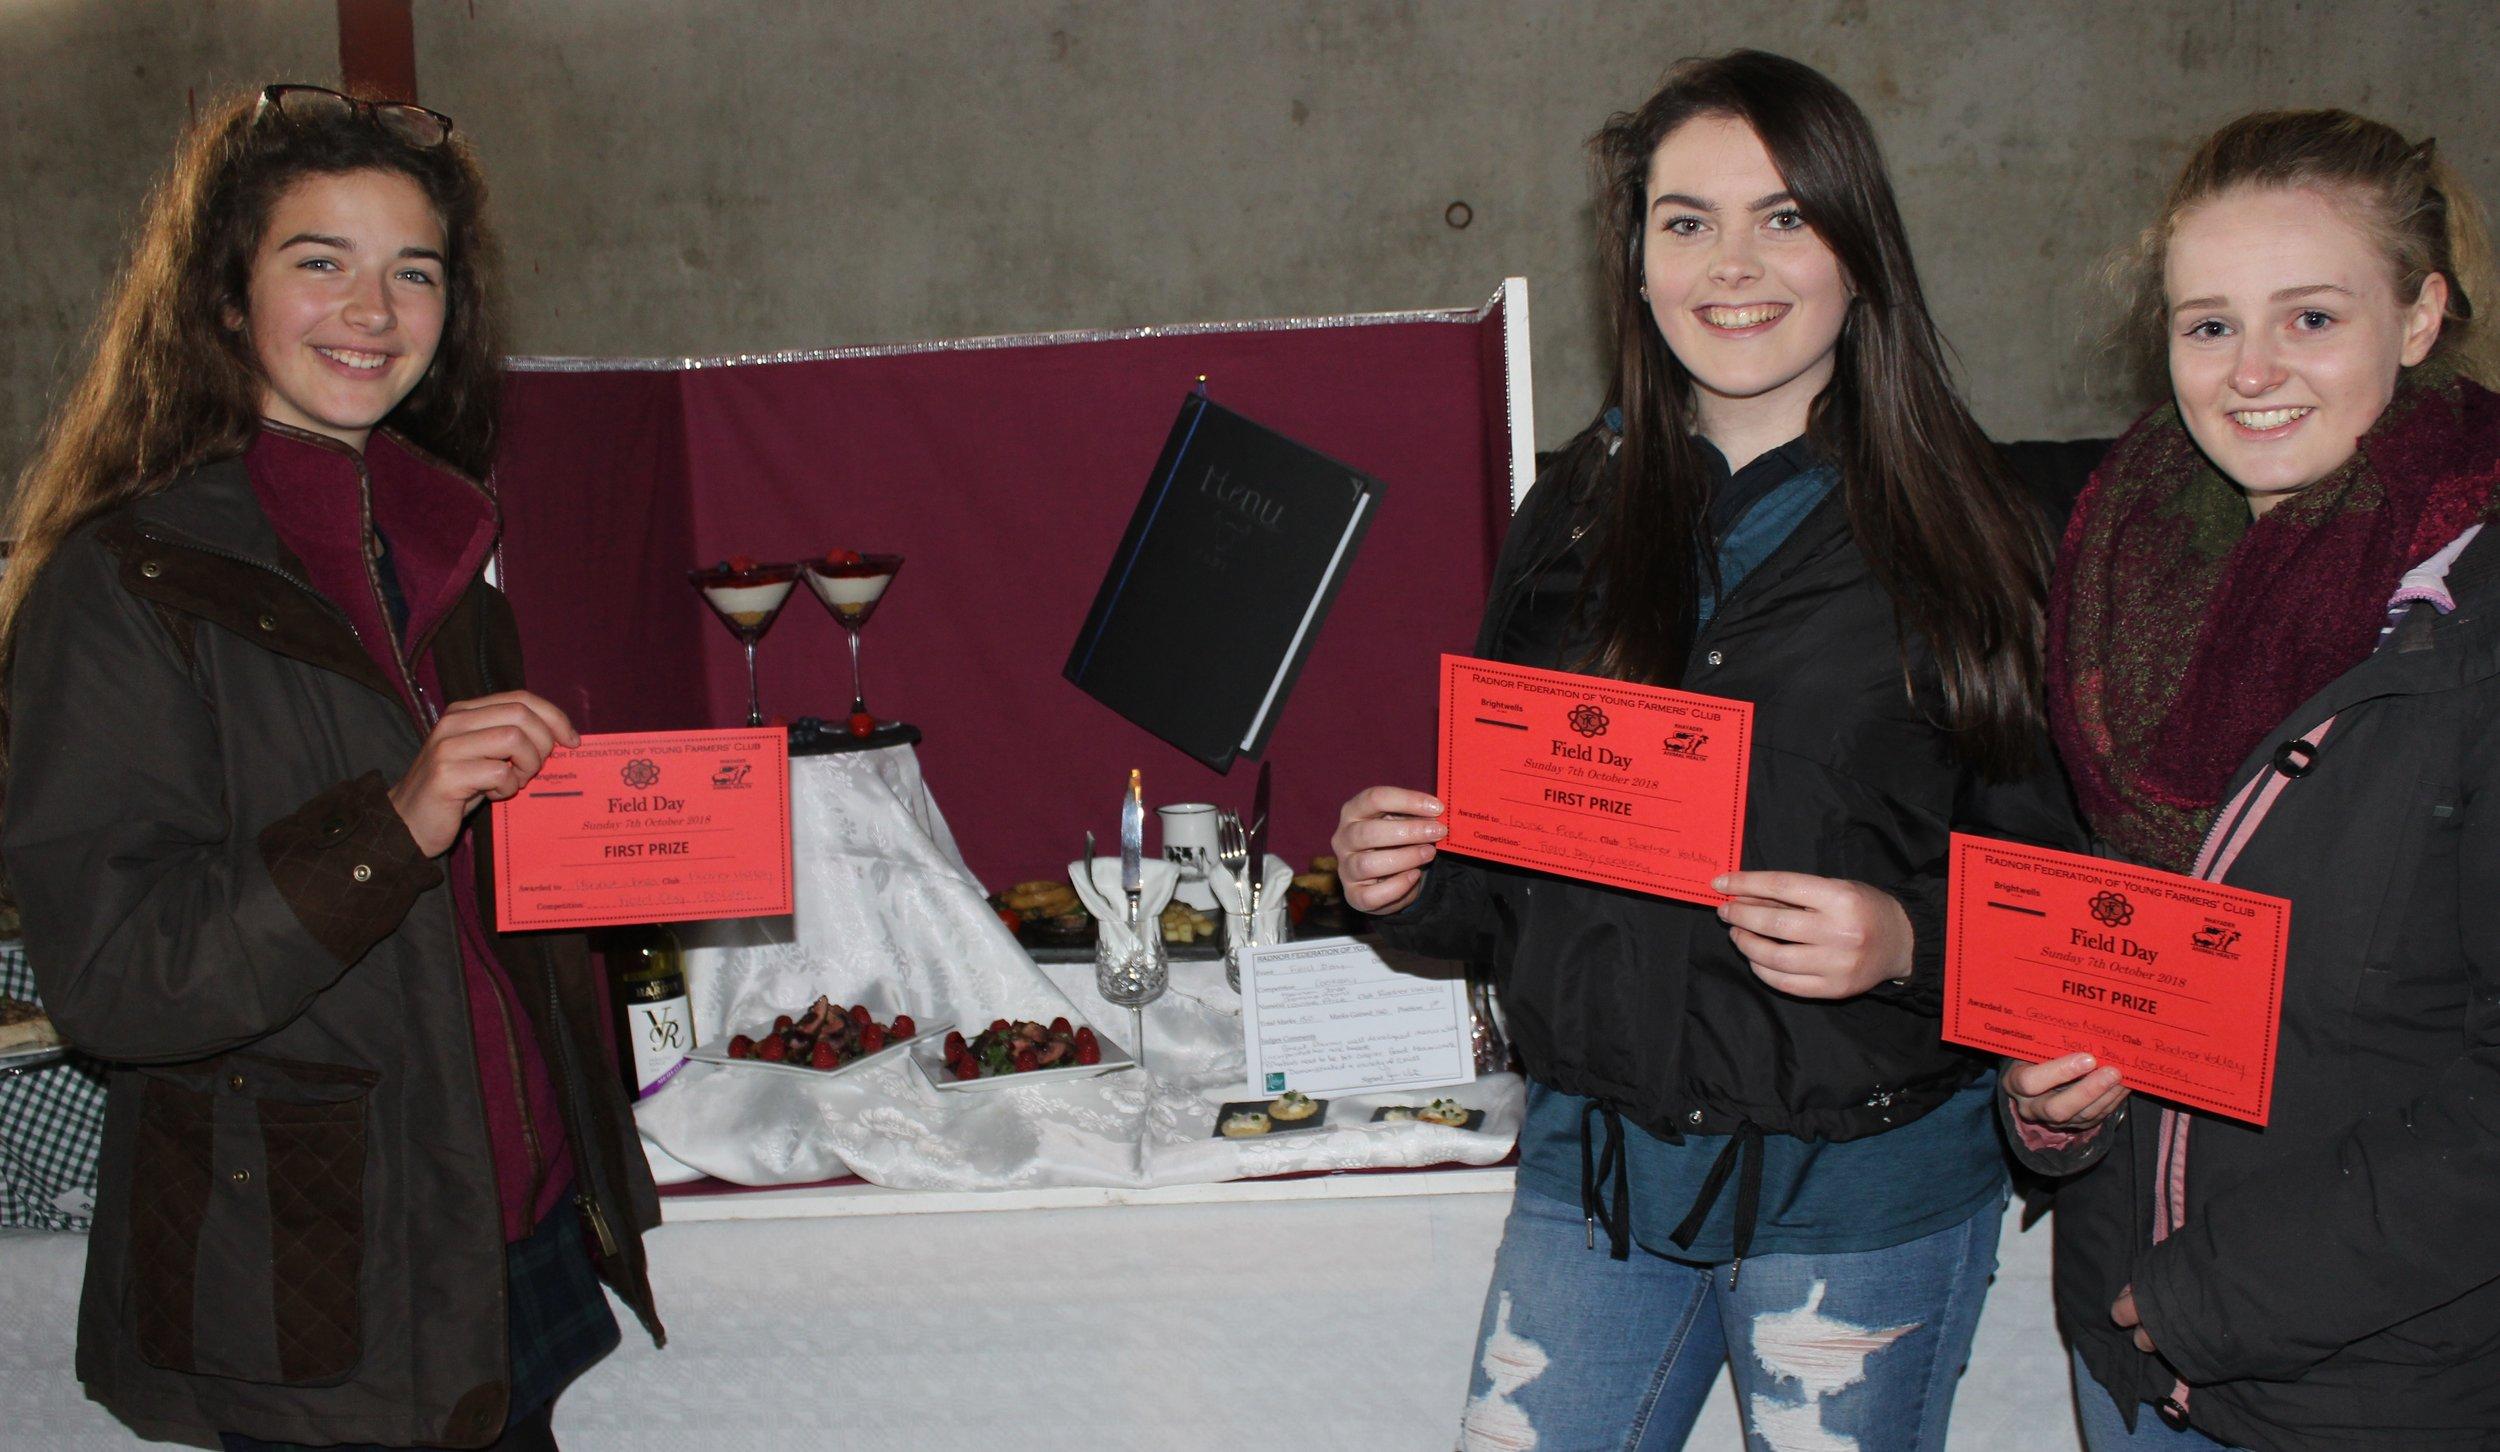 Hannah Jones, Louise Price & Gemma Morris, Radnor Valley YFC winning the Cookery competition